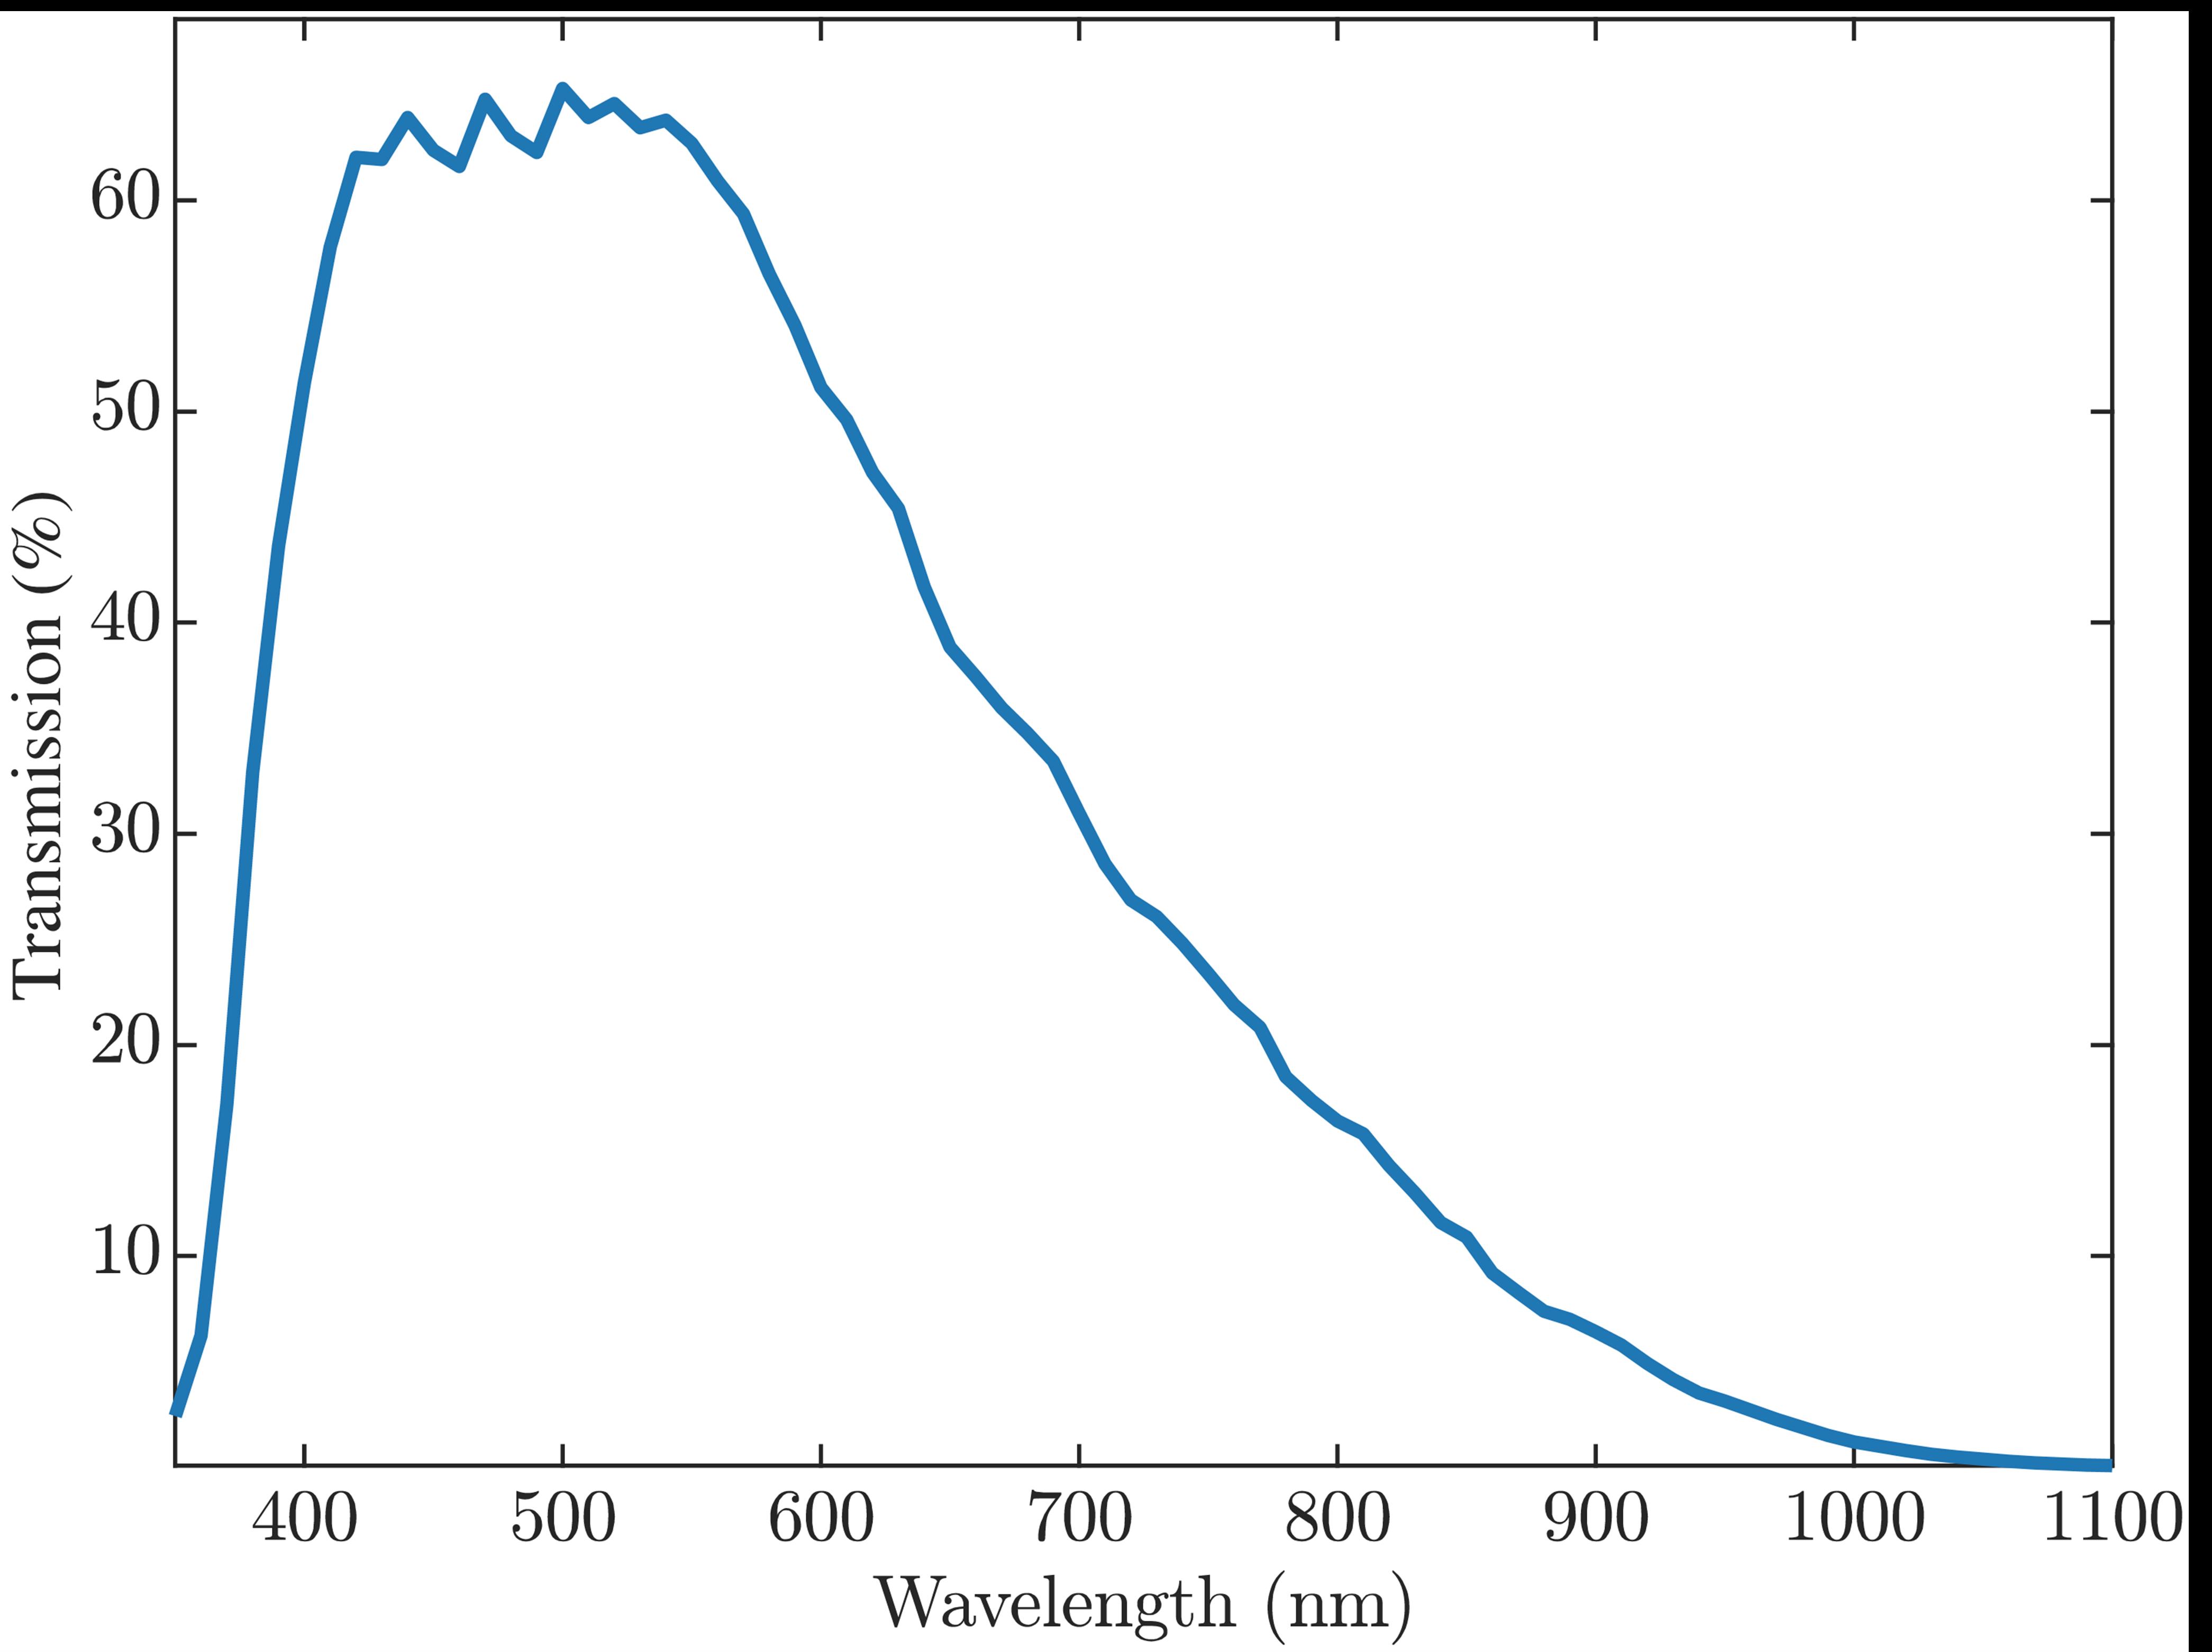 GMAX3238 Mono - Spectral response